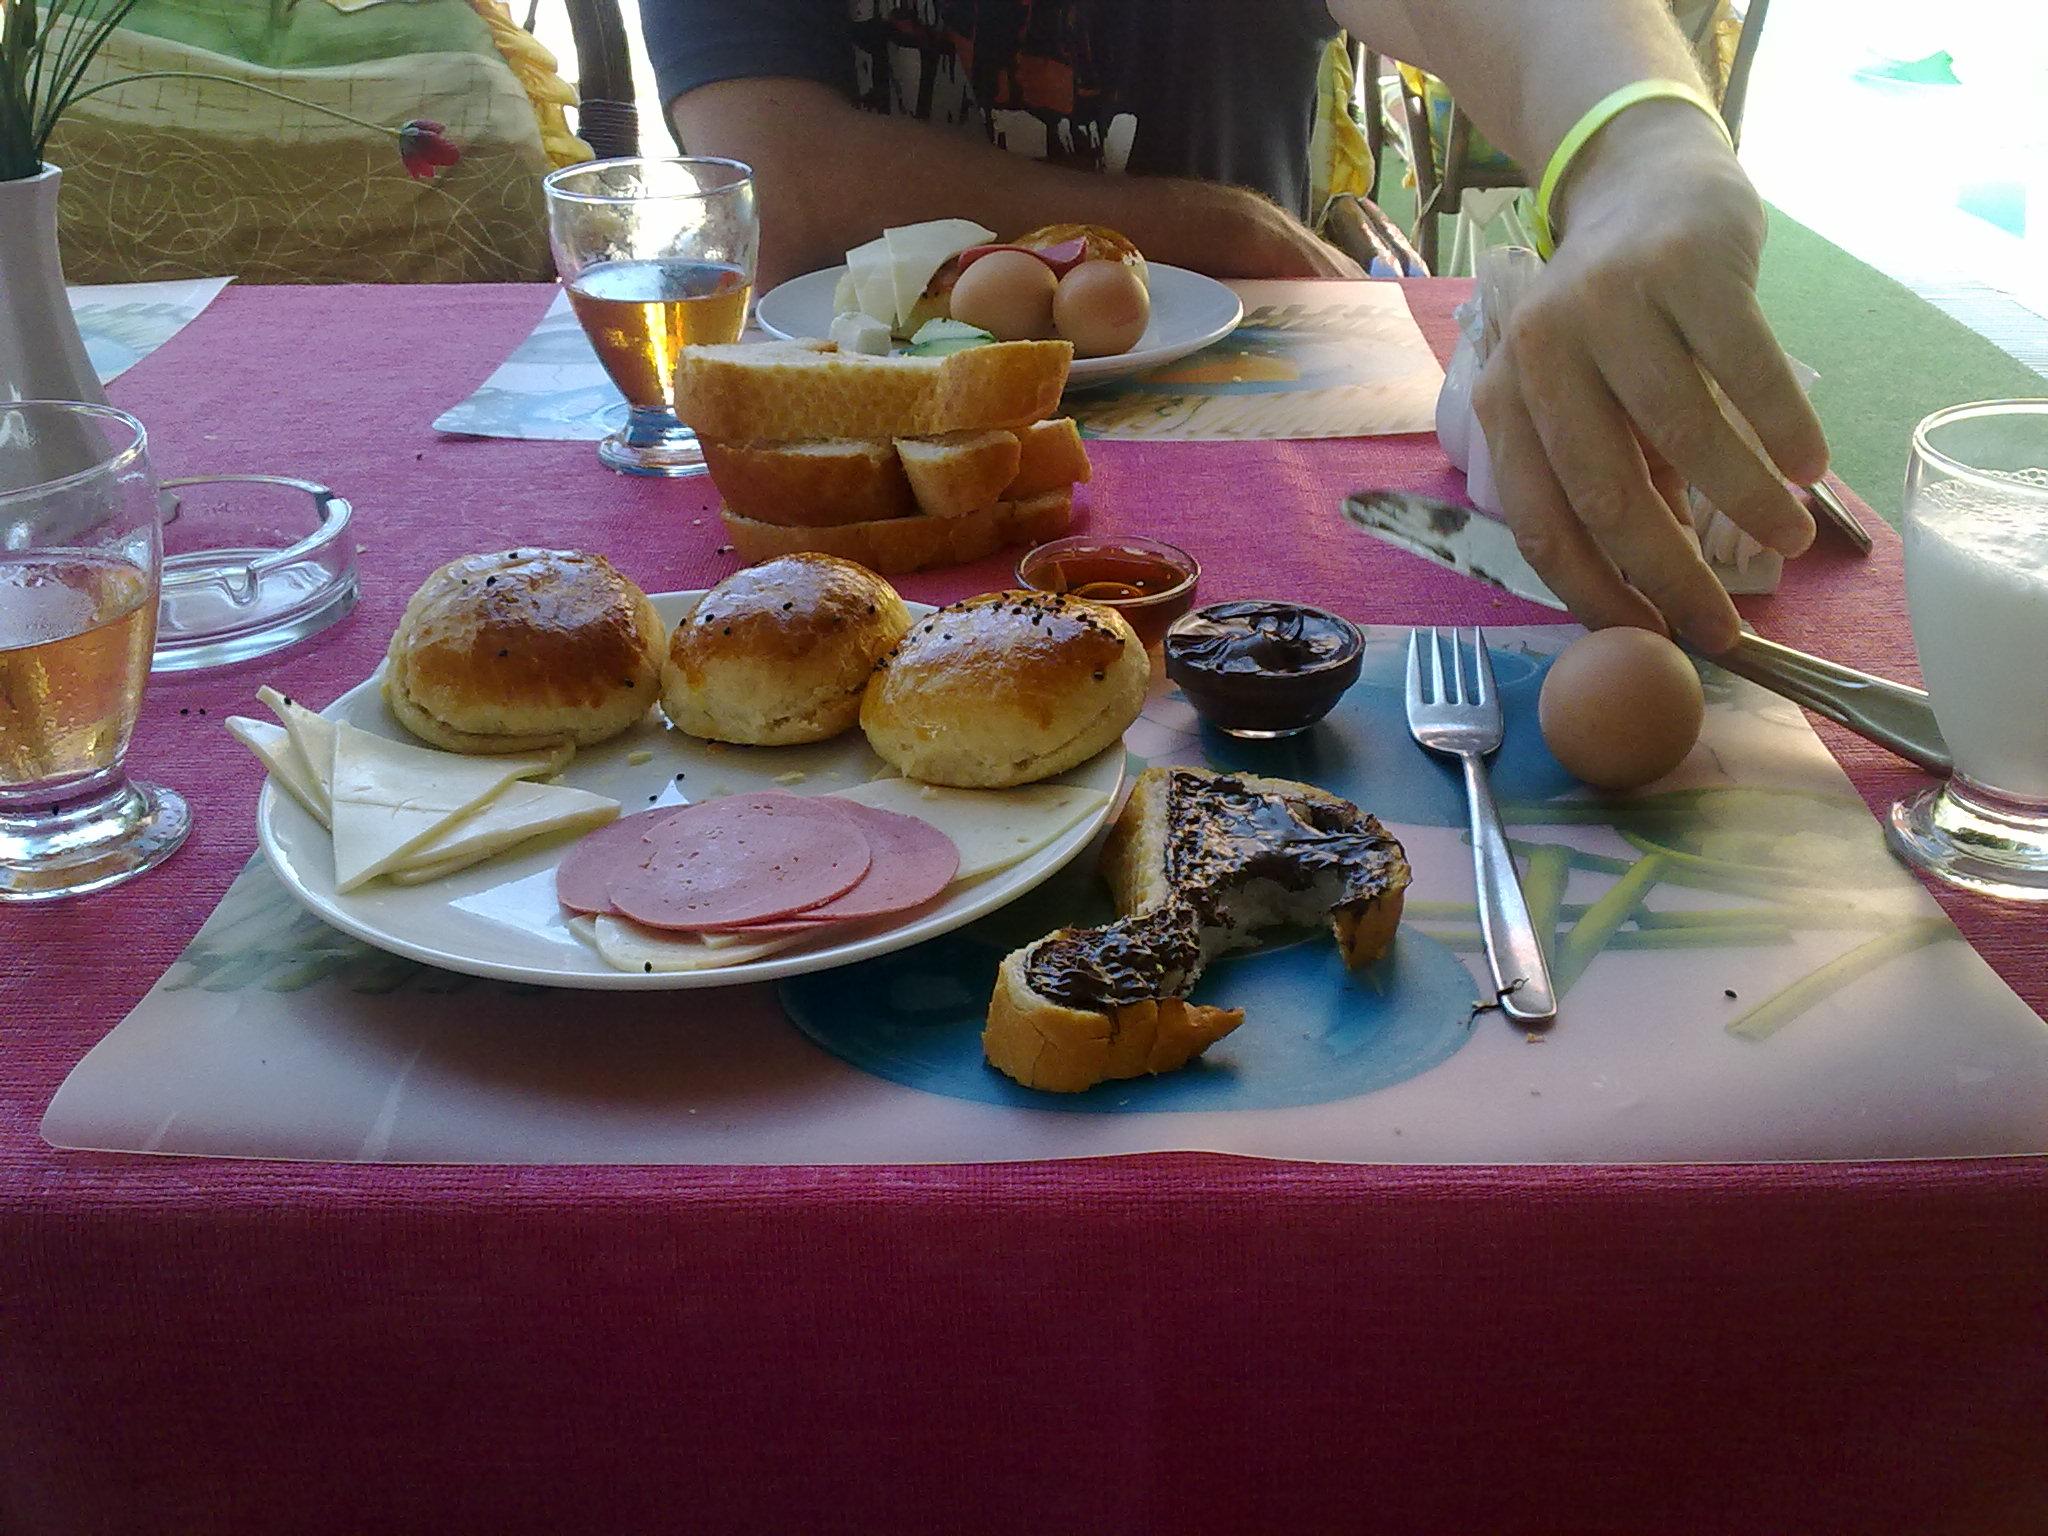 https://foodloader.net/glKz_2010-08-25_TurkishBreakfast.jpg